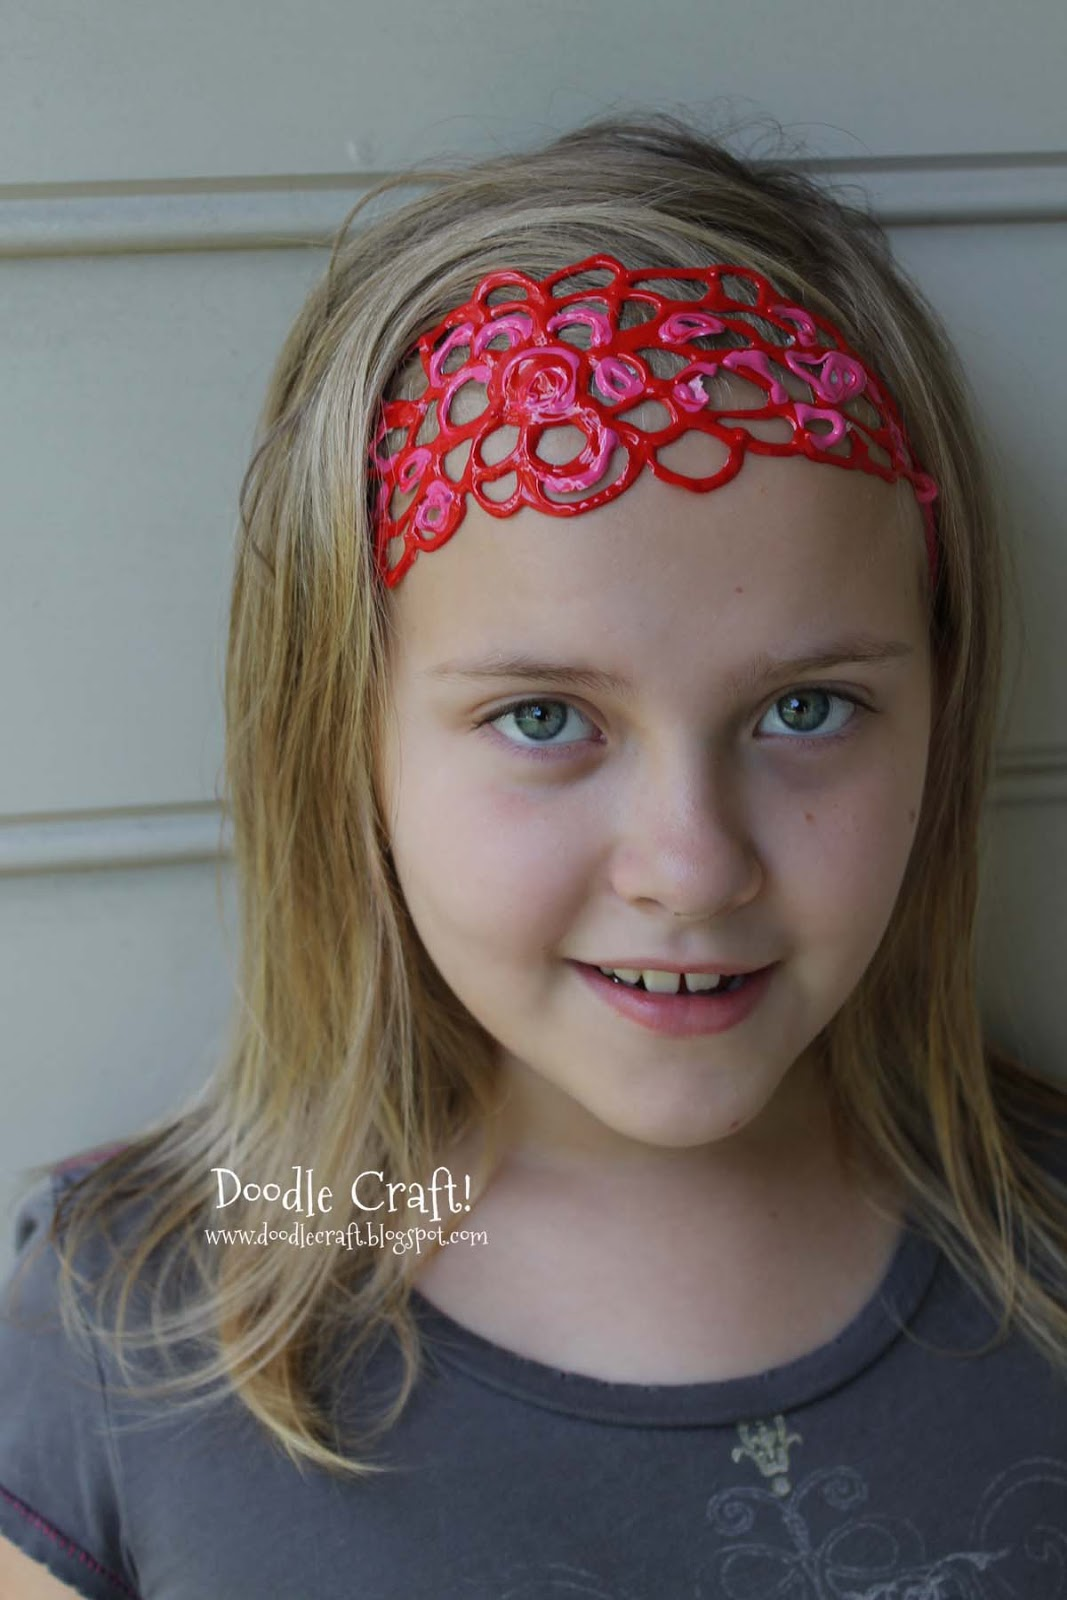 Puffy Paint Bracelets Wristbands And Headbands